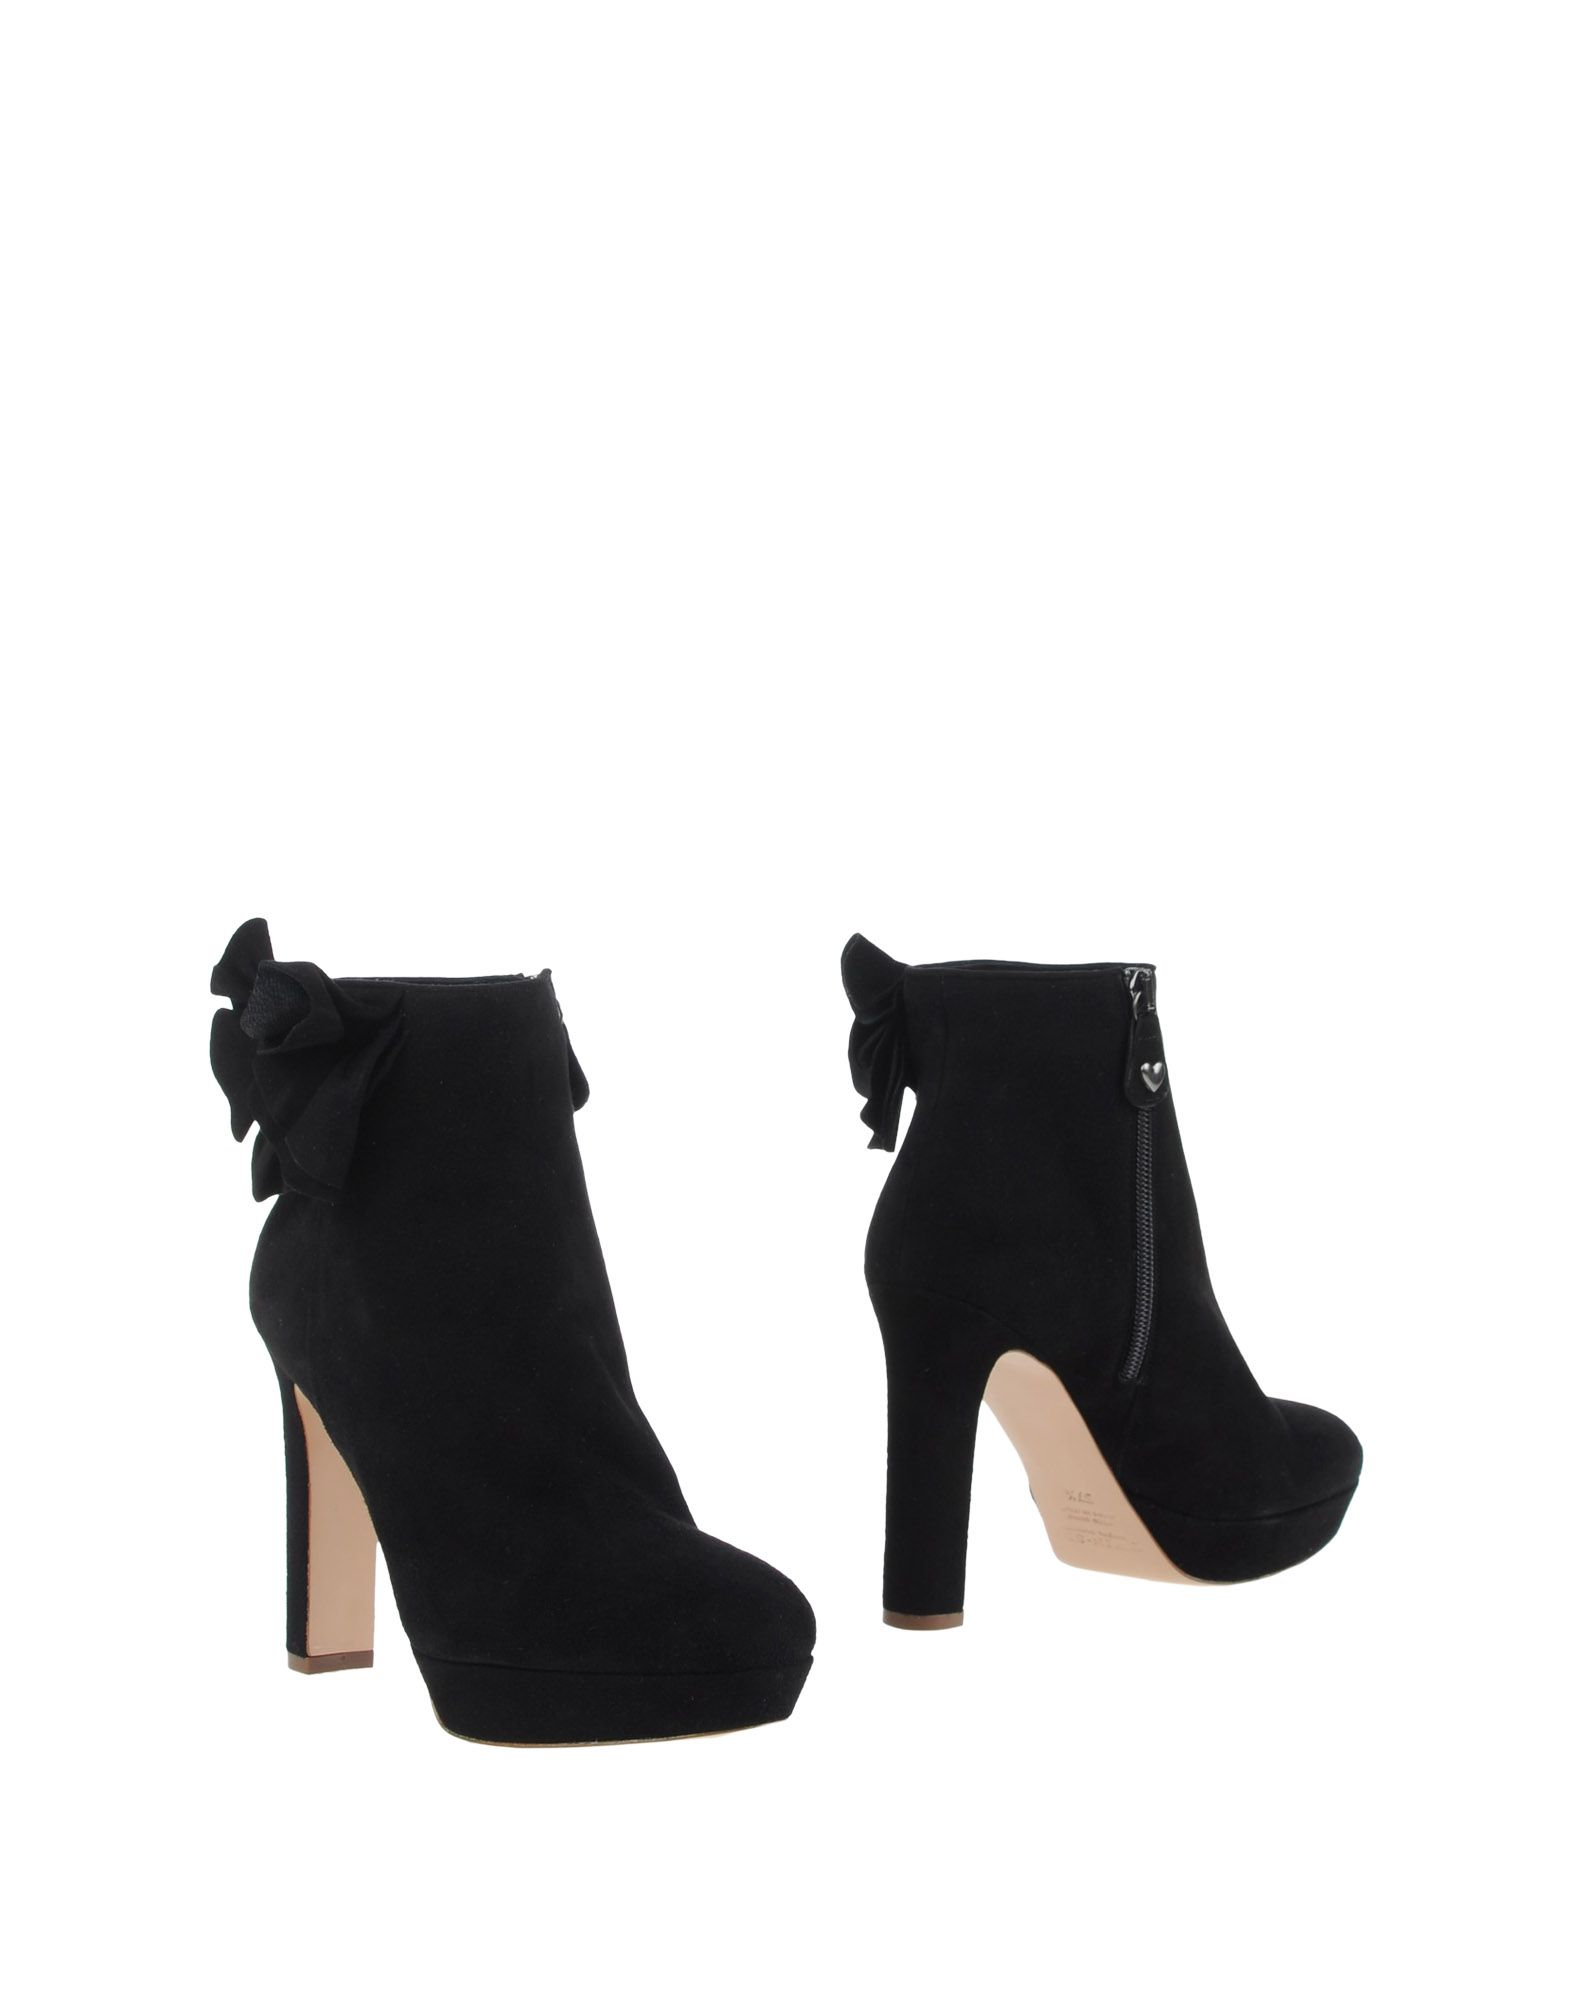 Haltbare Mode Beliebte billige Schuhe Twin 11048754MN Beliebte Mode Schuhe 446c9e